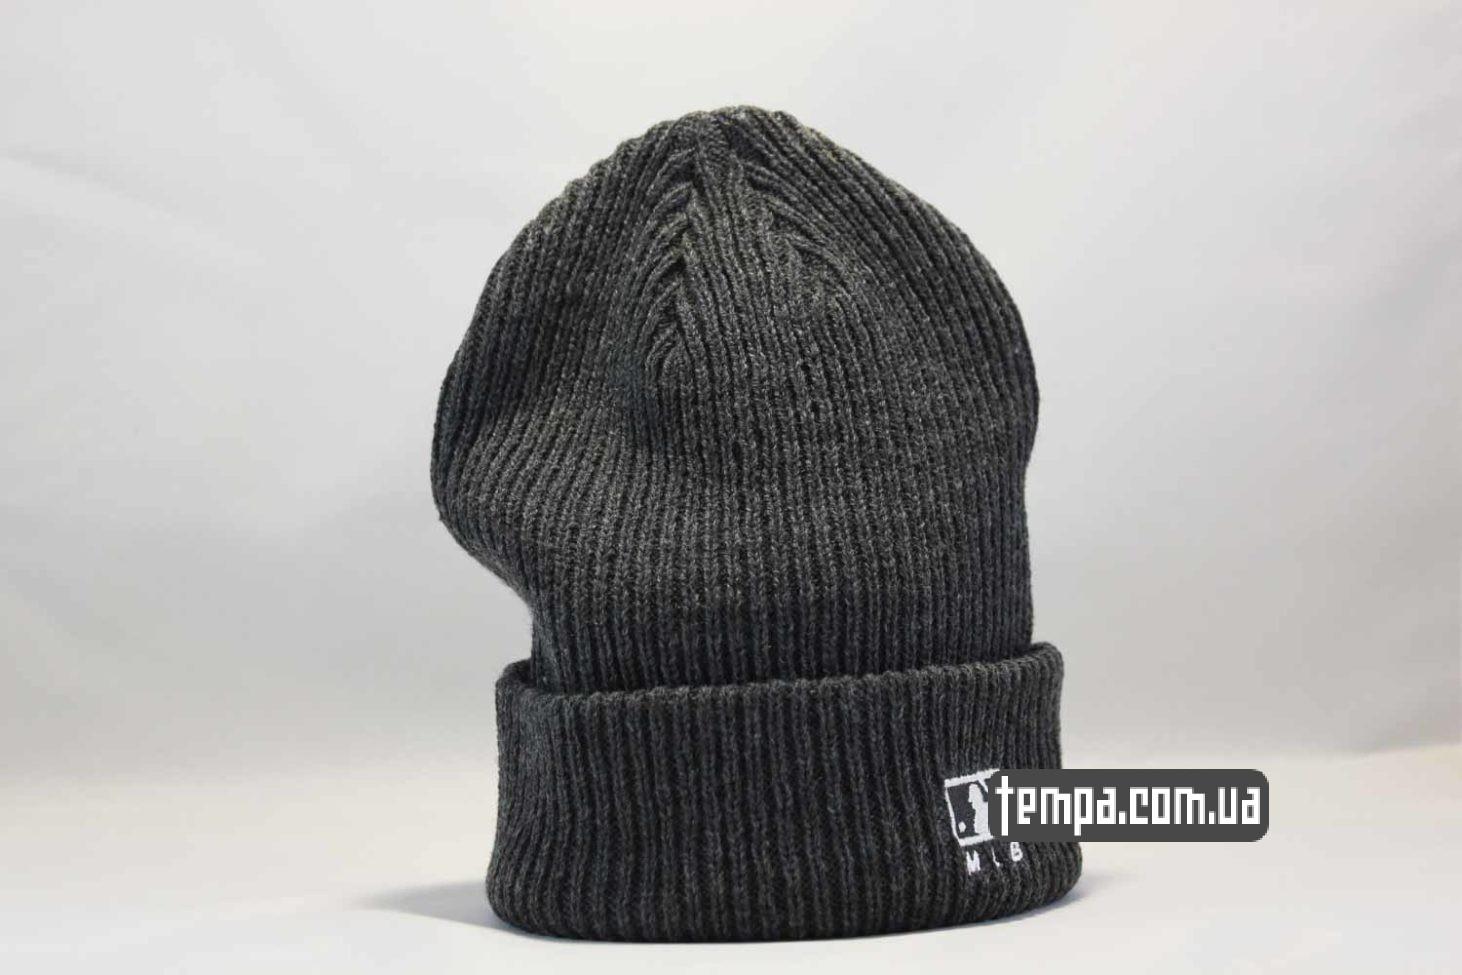 теплая зимняя шапка beanie LA Los Angeles New Era серая